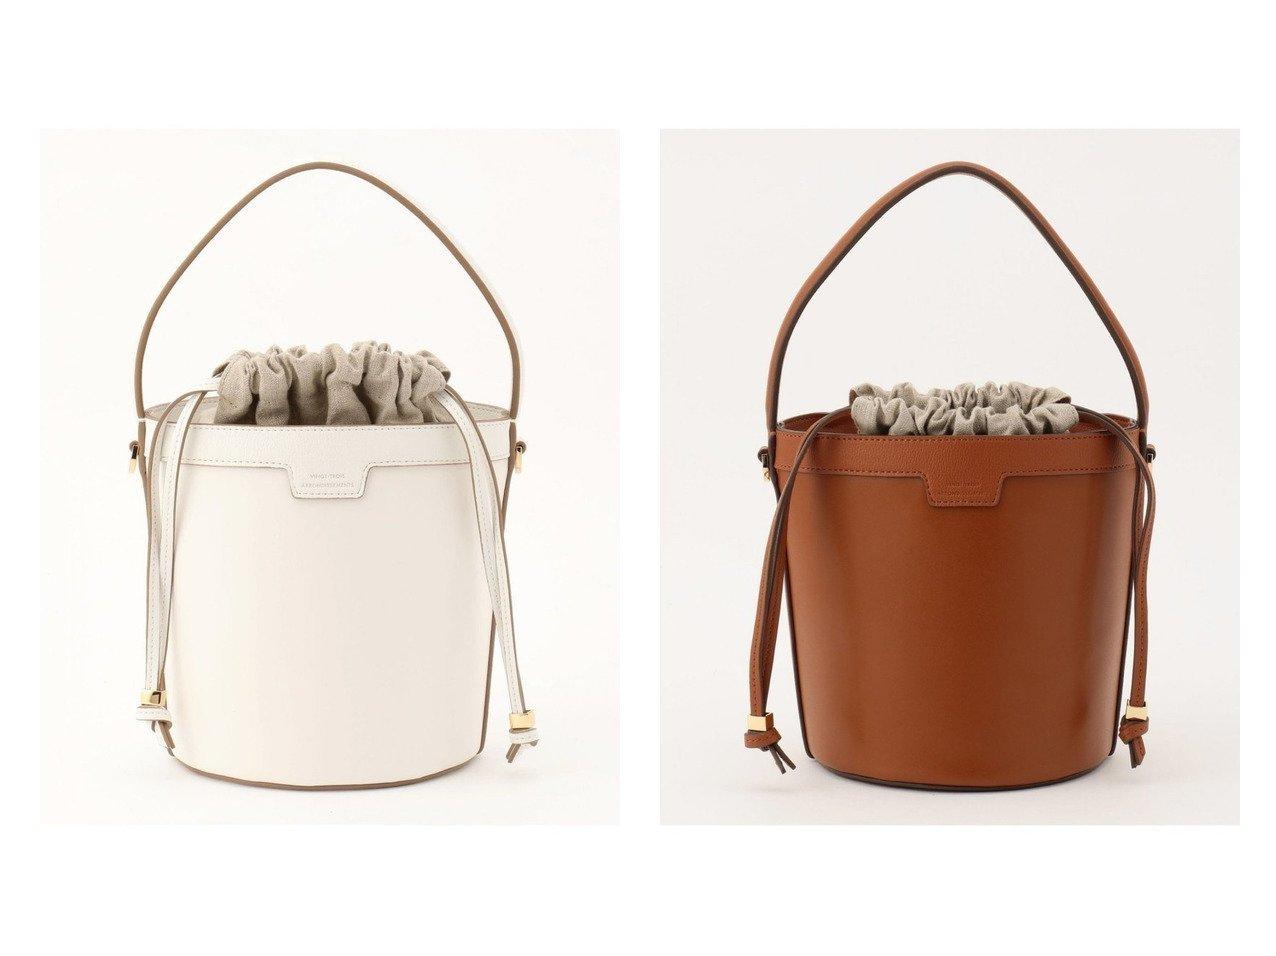 【NIJYUSANKU/23区】のBUCKET バッグ バッグ・鞄のおすすめ!人気、トレンド・レディースファッションの通販 おすすめで人気の流行・トレンド、ファッションの通販商品 メンズファッション・キッズファッション・インテリア・家具・レディースファッション・服の通販 founy(ファニー) https://founy.com/ ファッション Fashion レディースファッション WOMEN バッグ Bag NEW・新作・新着・新入荷 New Arrivals 2021年 2021 2021 春夏 S/S SS Spring/Summer 2021 S/S 春夏 SS Spring/Summer オレンジ ハンドバッグ バケツ リネン |ID:crp329100000014159